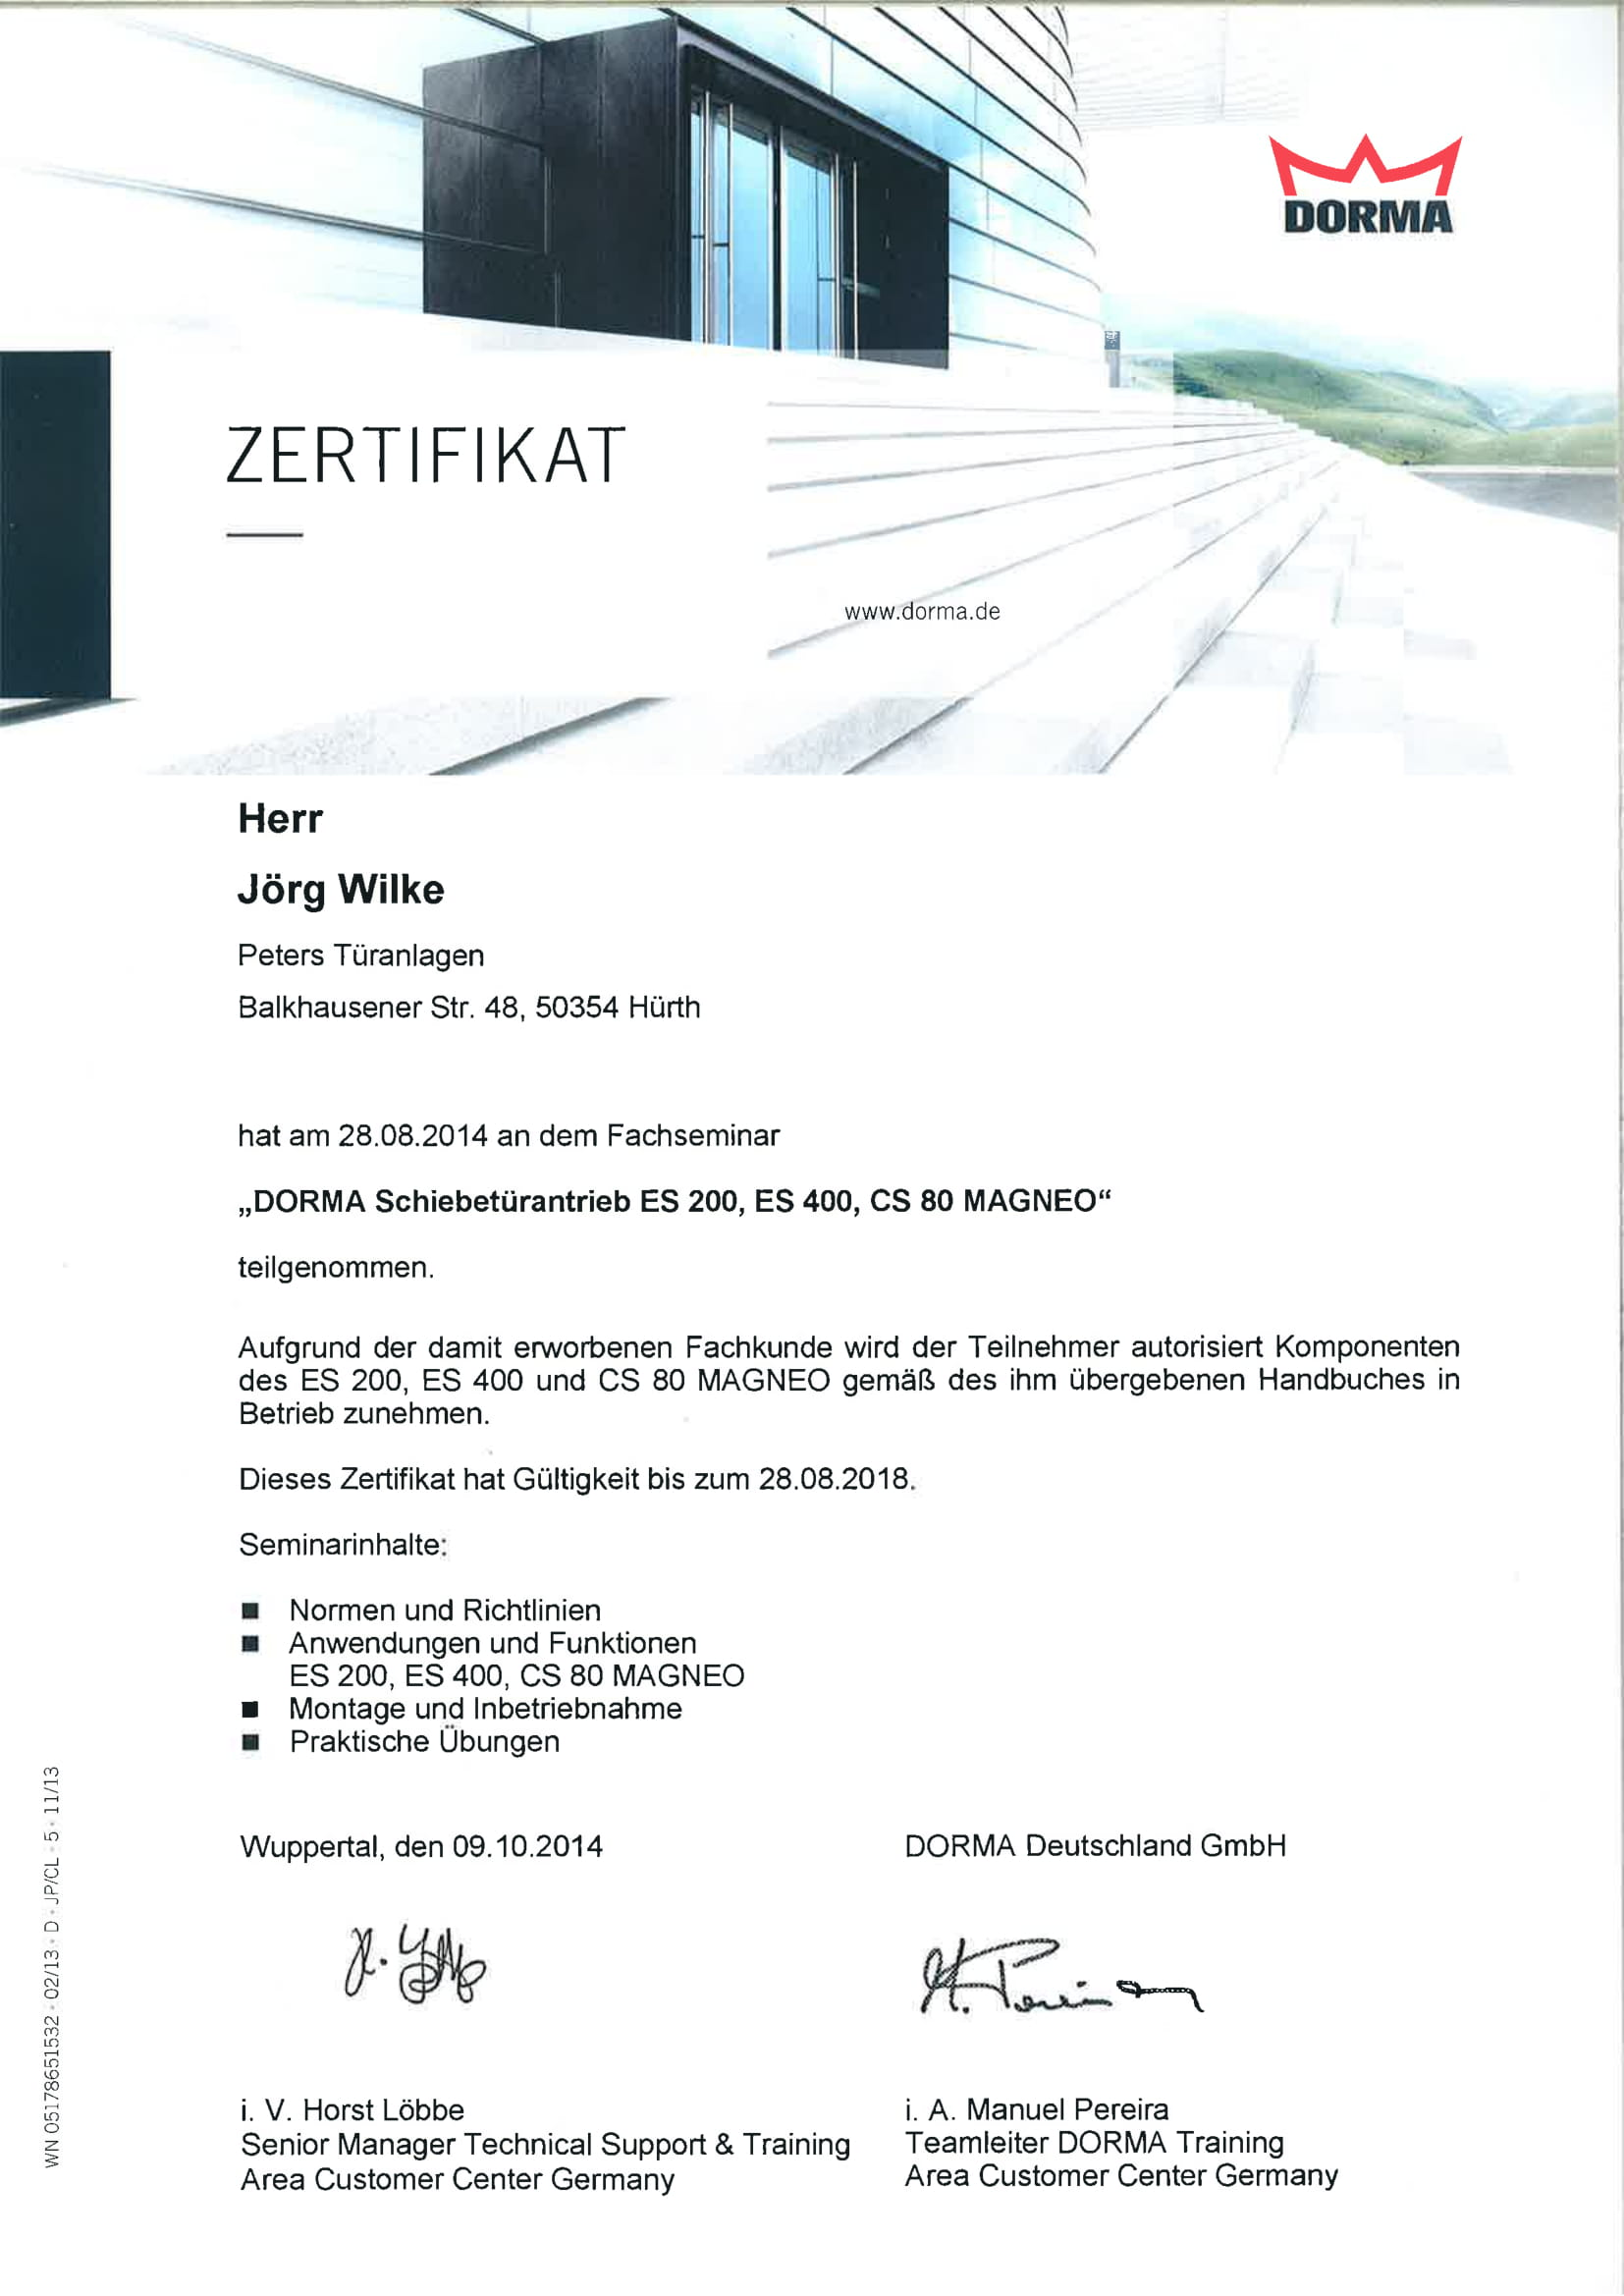 Dorma Zertifikat